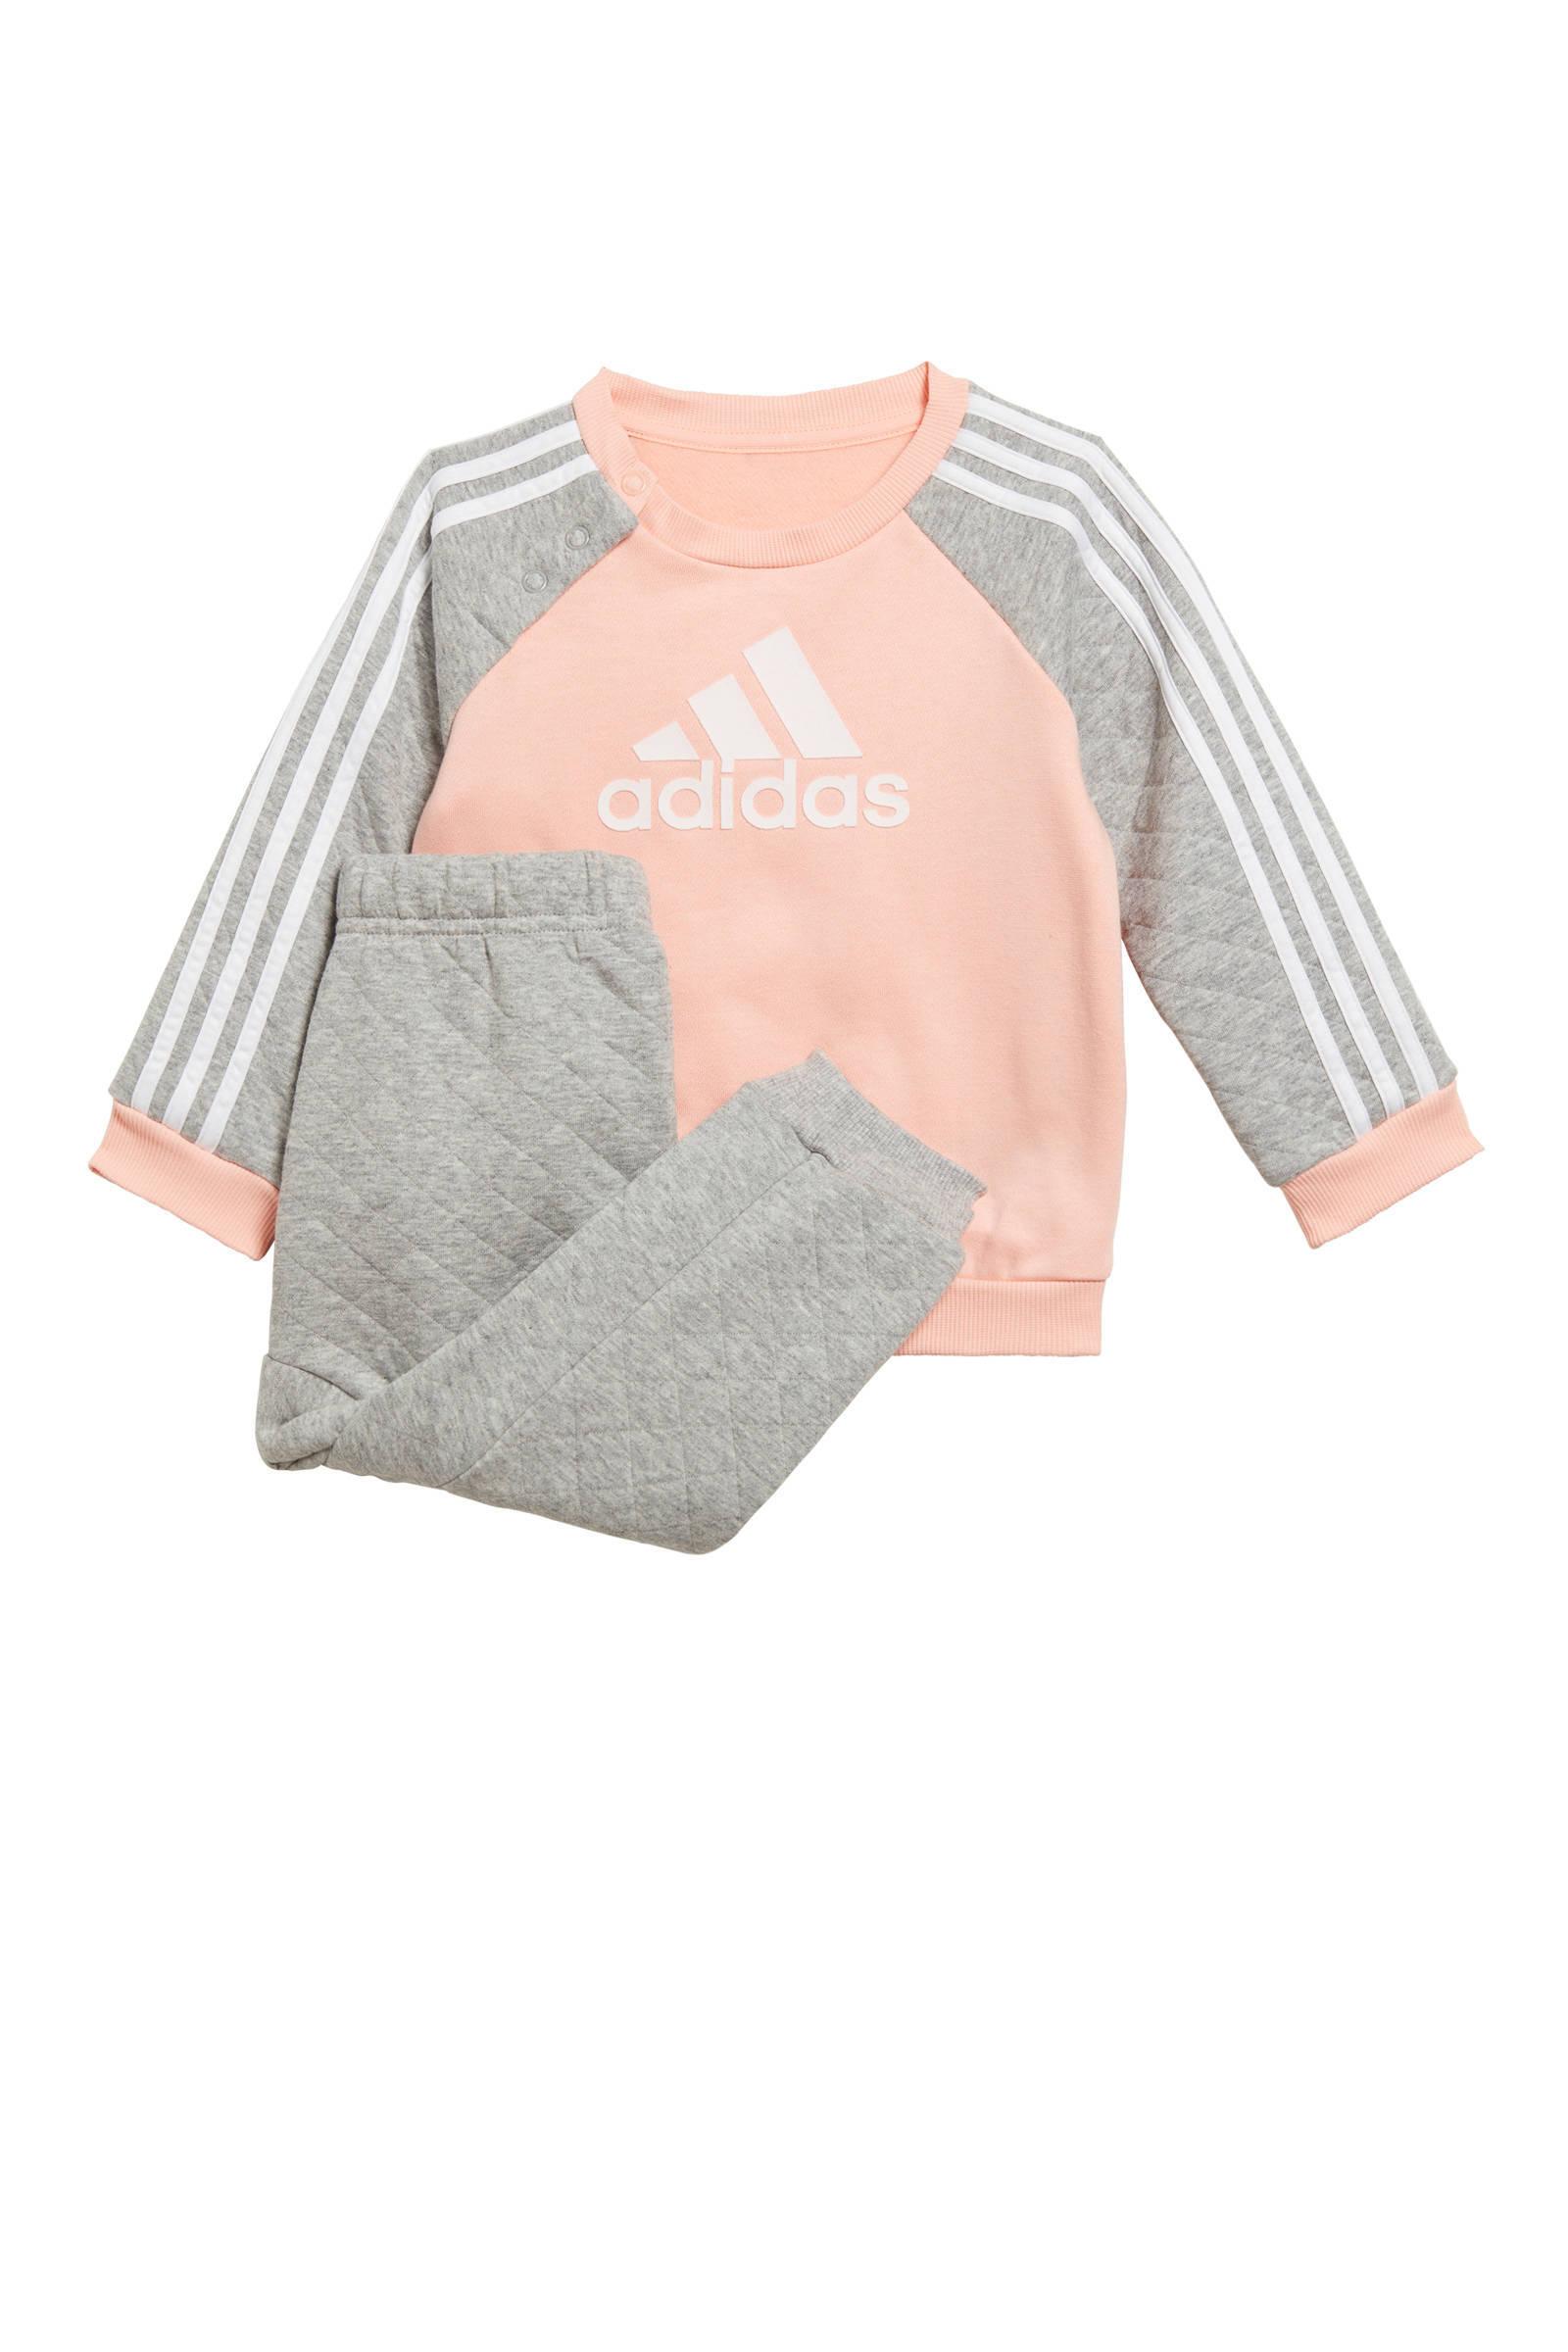 adidas trainingspak baby sale